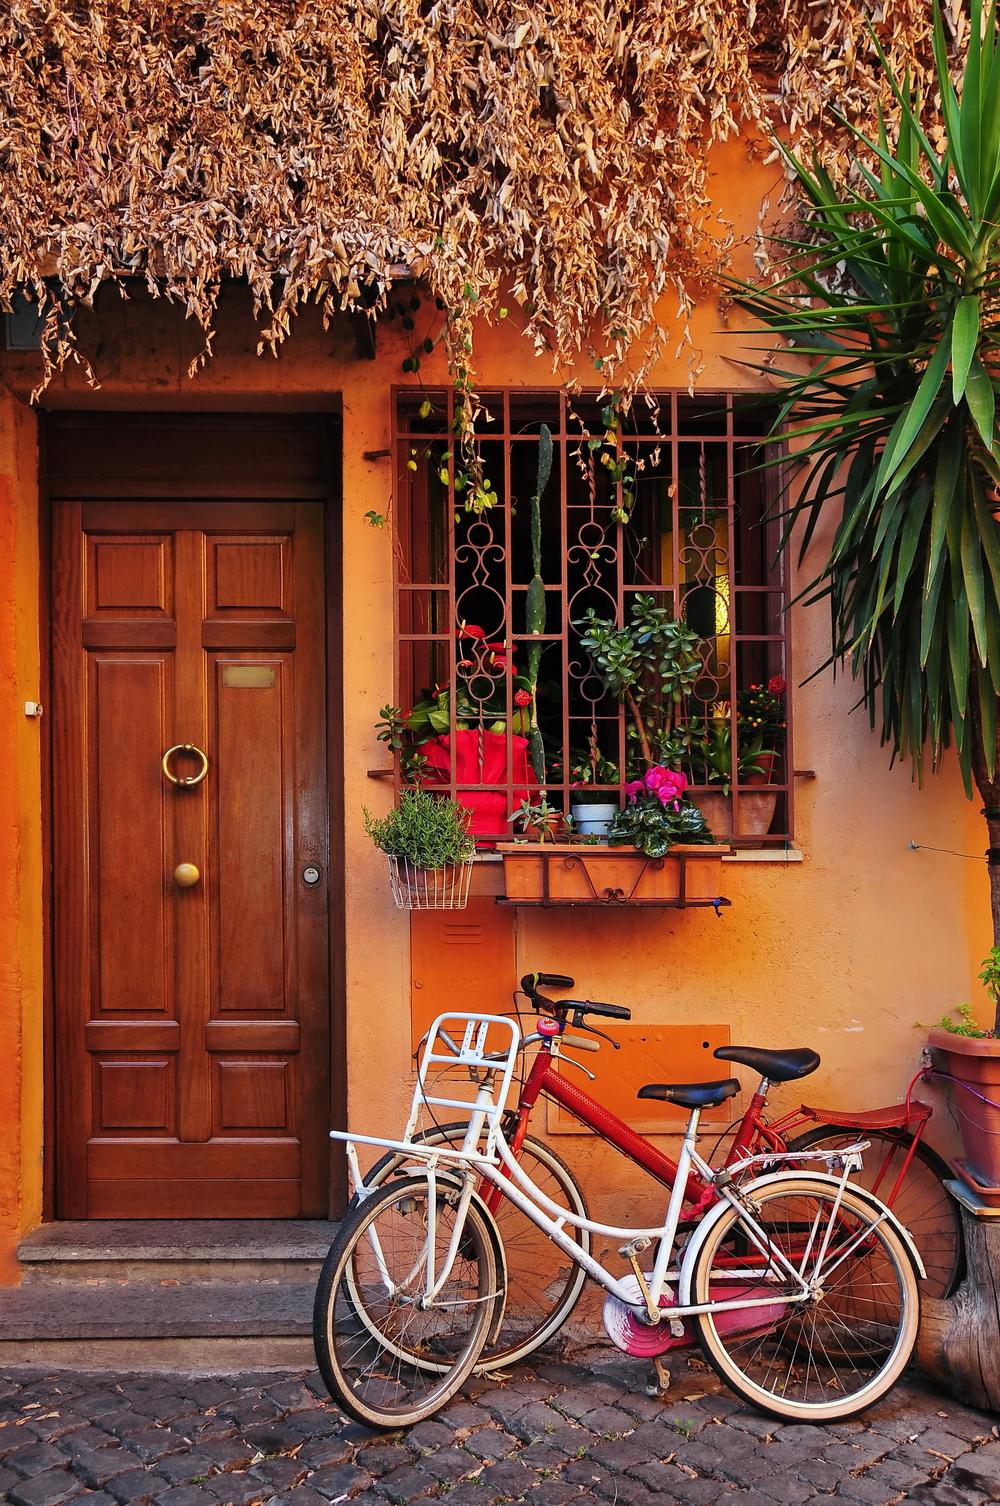 Bikes in Trastevere.jpg